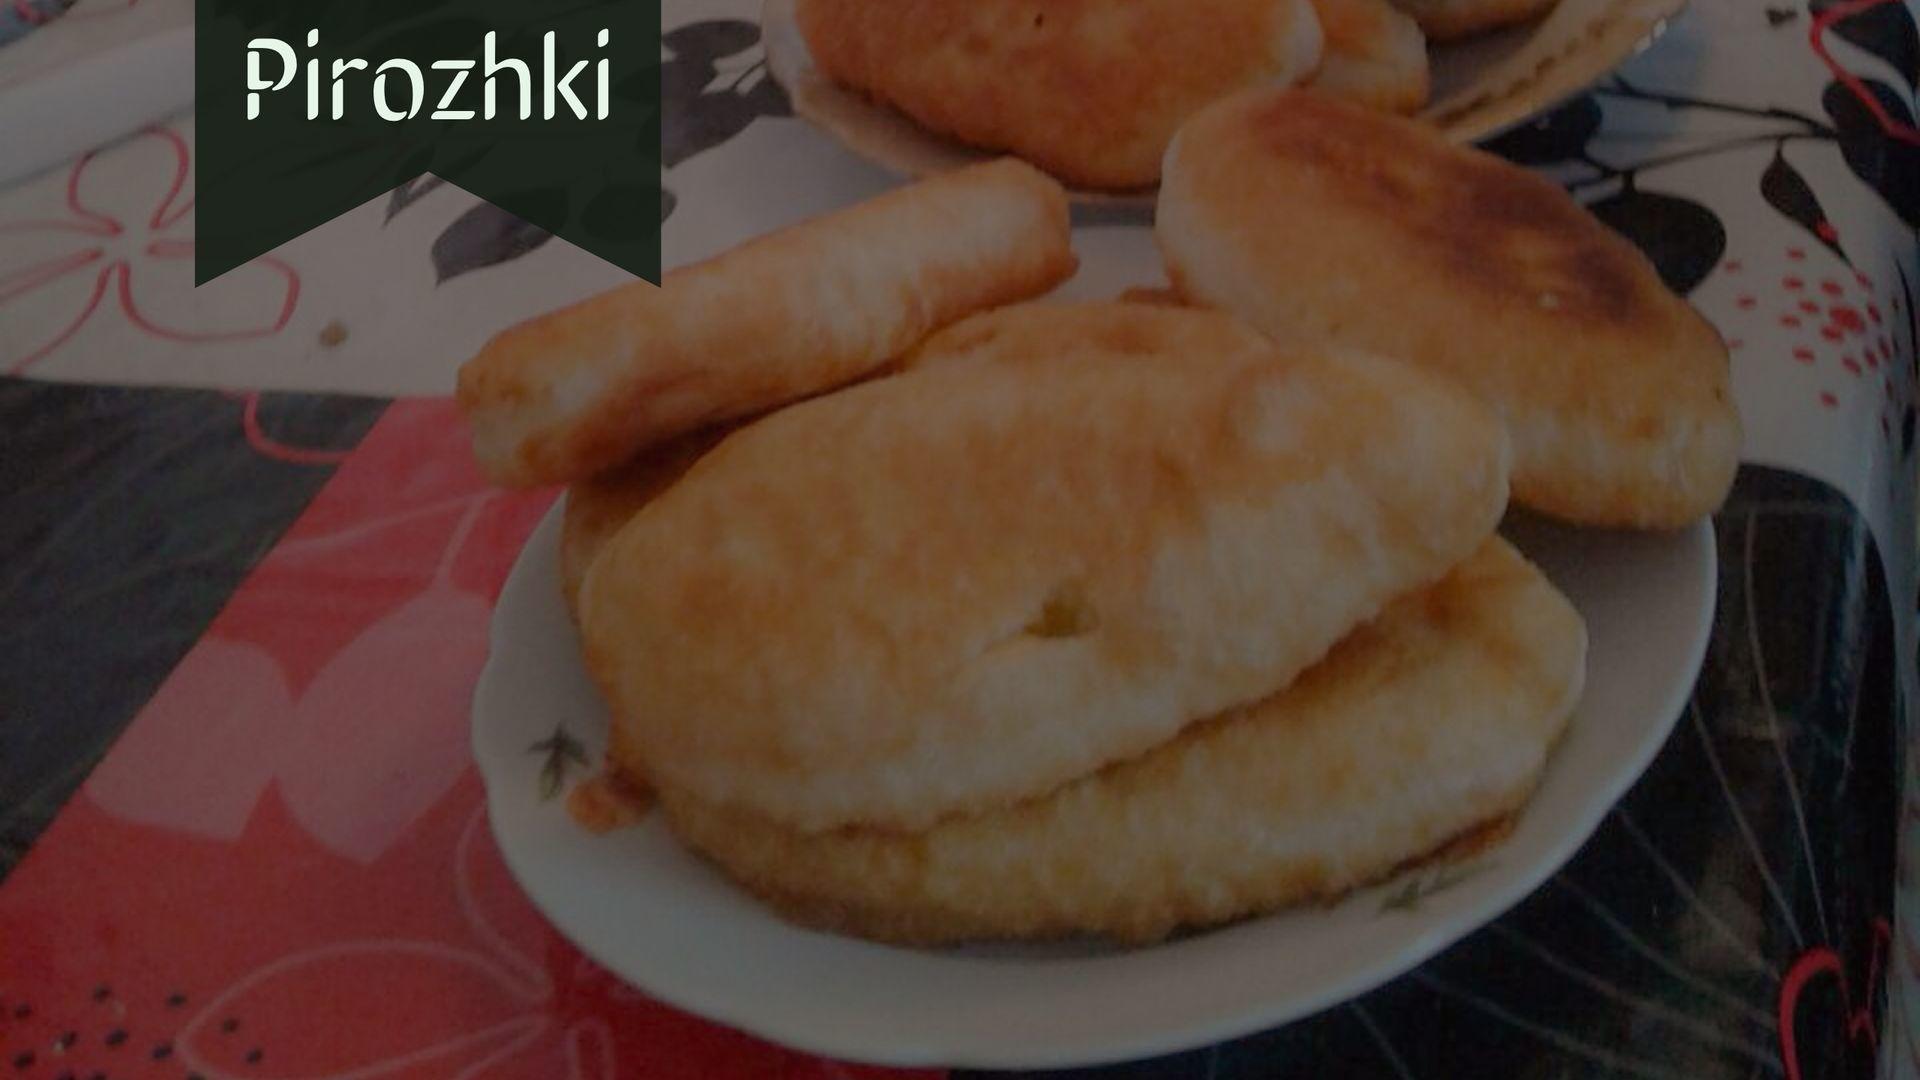 pirojki or pirozhki baked and fried apetizers